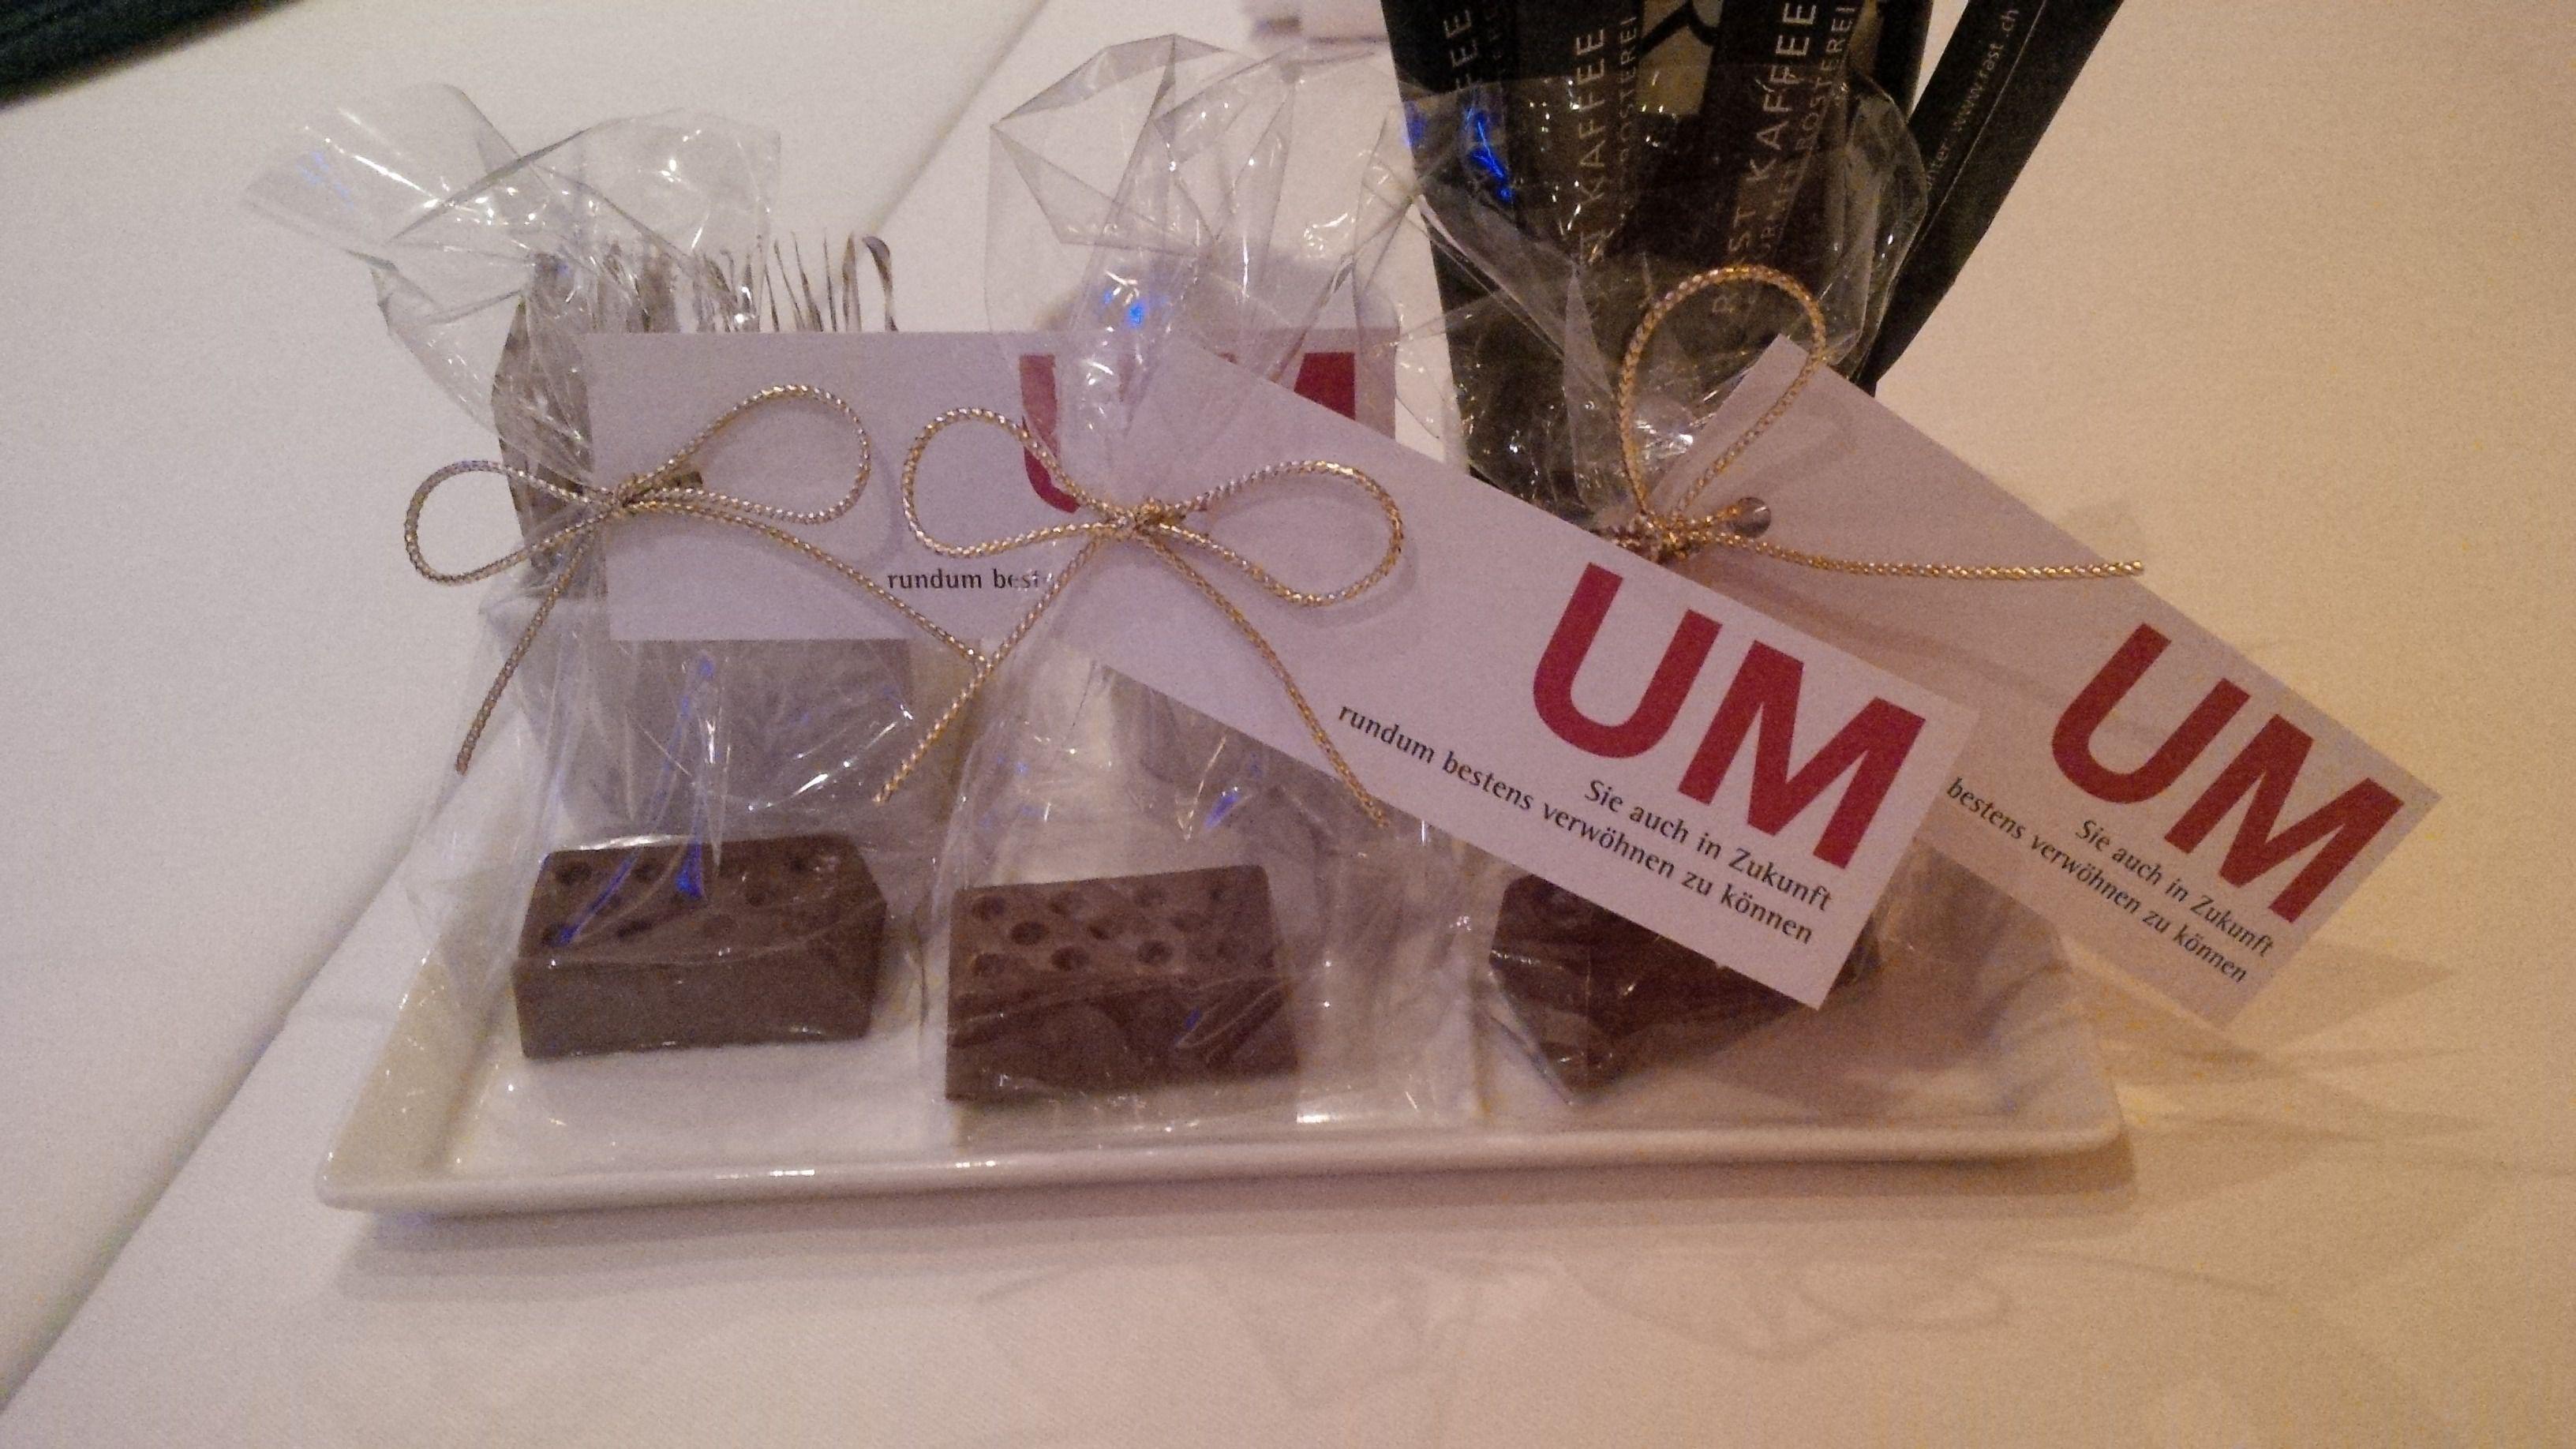 Lego chocolates @ Restaurant Baccara